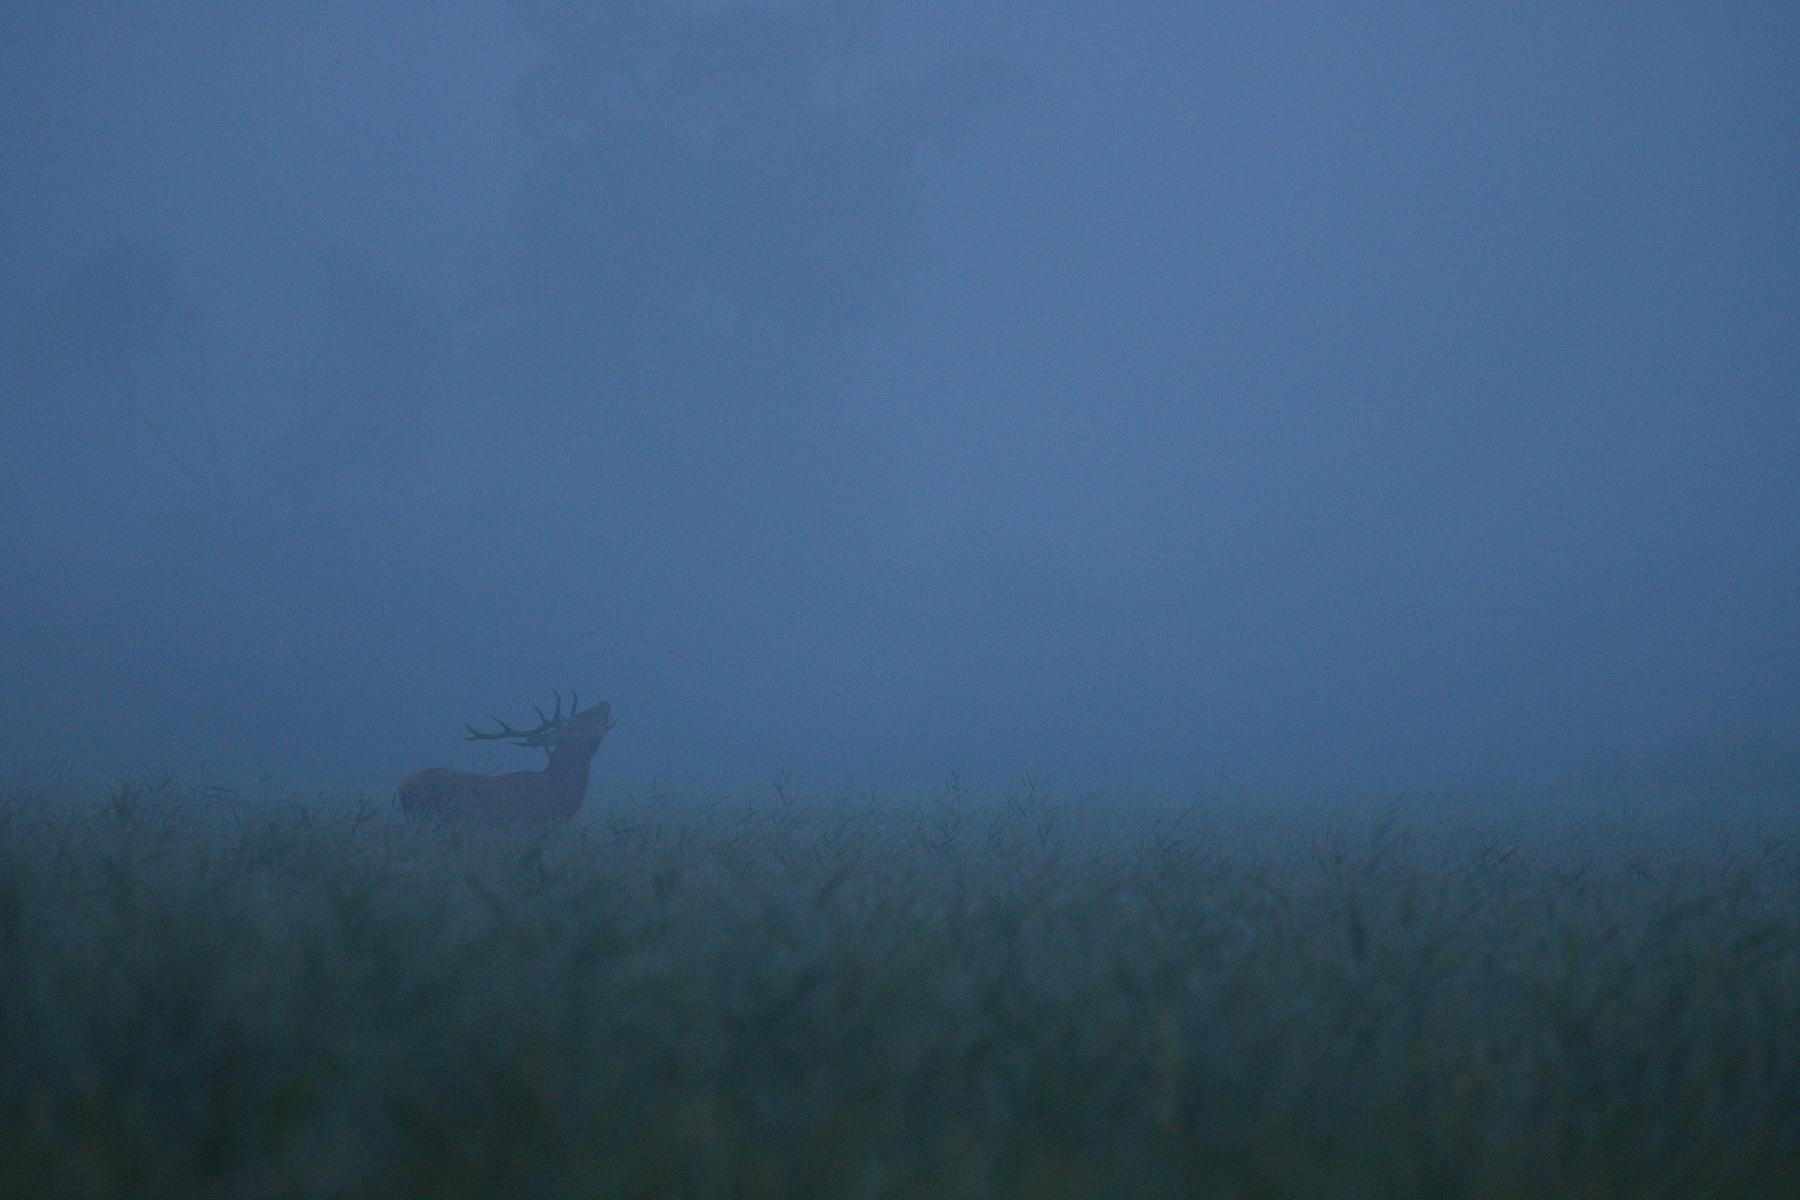 jeleň lesný (Cervus elaphus) Red deer, NPR Kláštorské lúky, Turčianska kotlina, Slovensko Canon EOS 6D mark II, Canon 400 mm f5.6 L USM, f5.6, 1/160, ISO 2000, 16. september 2019